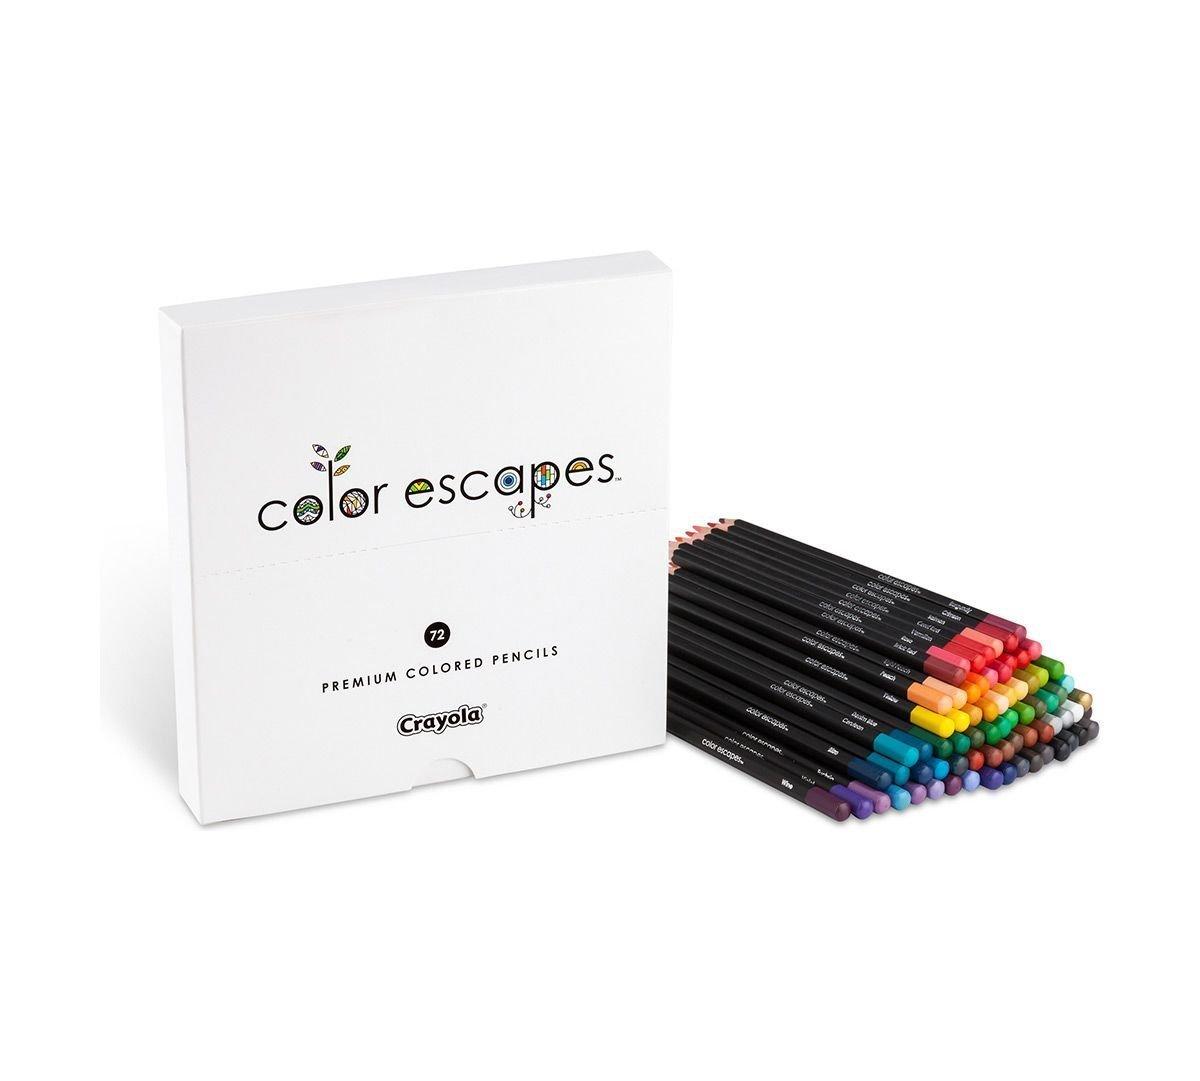 Crayola Color Escapes Colored Pencils, 72 Count, Adult Coloring, Gift by Crayola